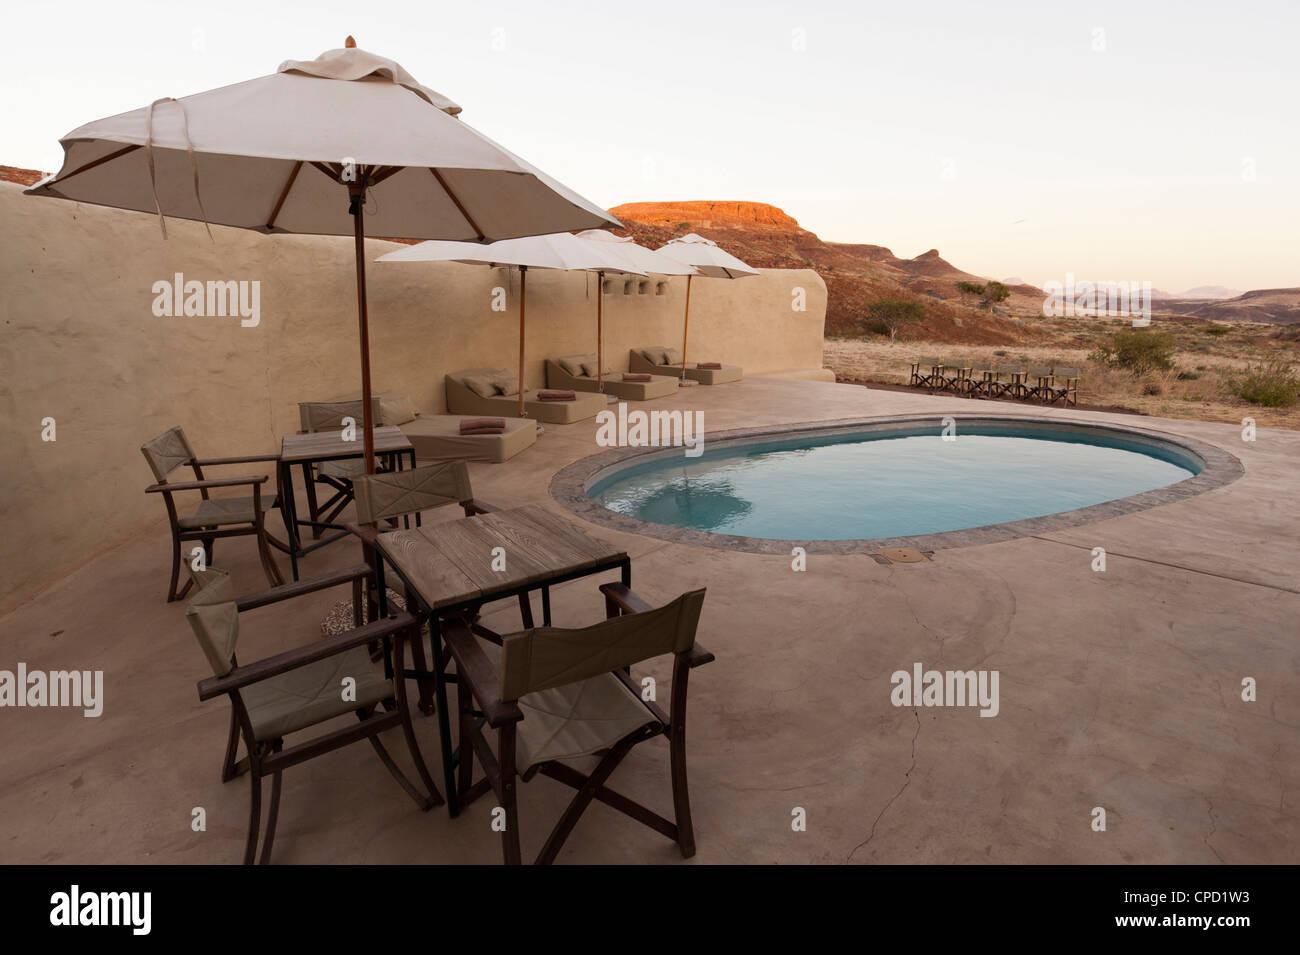 Damaraland Camp, Huab River Valley, Torra Conservancy, Damaraland, Namibia, Africa - Stock Image